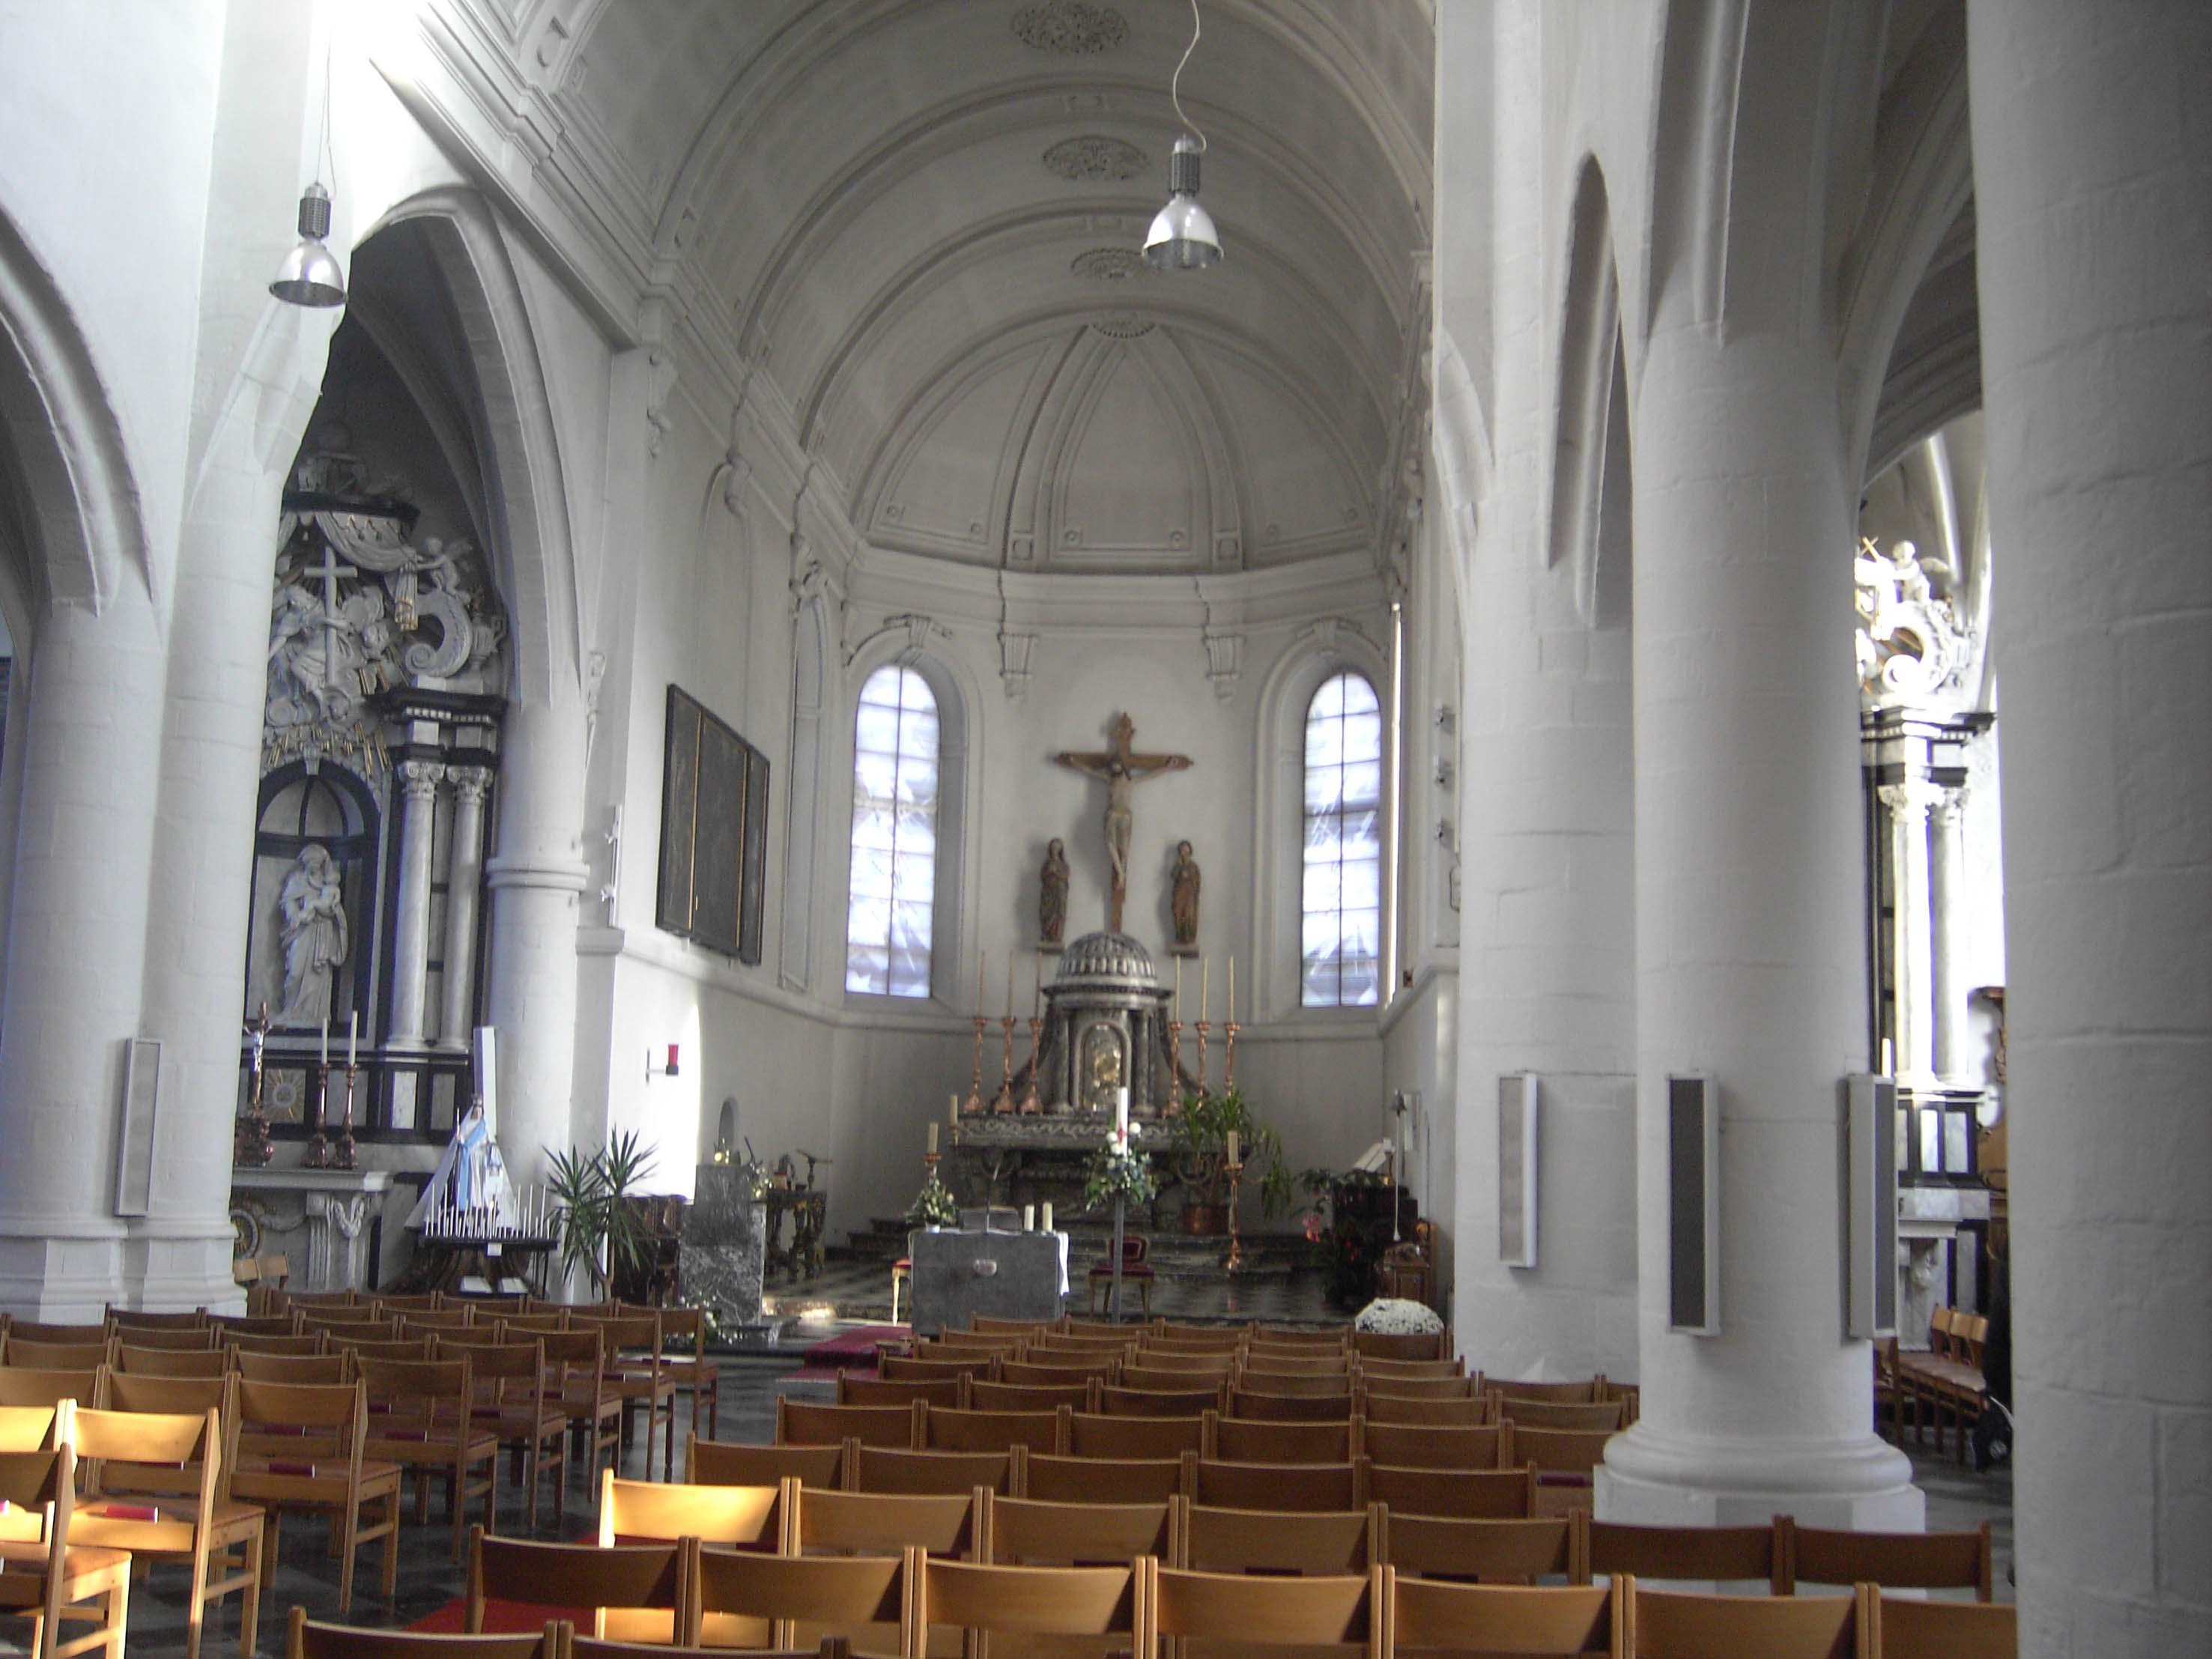 File:Wezemaal (Rotselaar België) - interieur kerk.jpg - Wikimedia ...